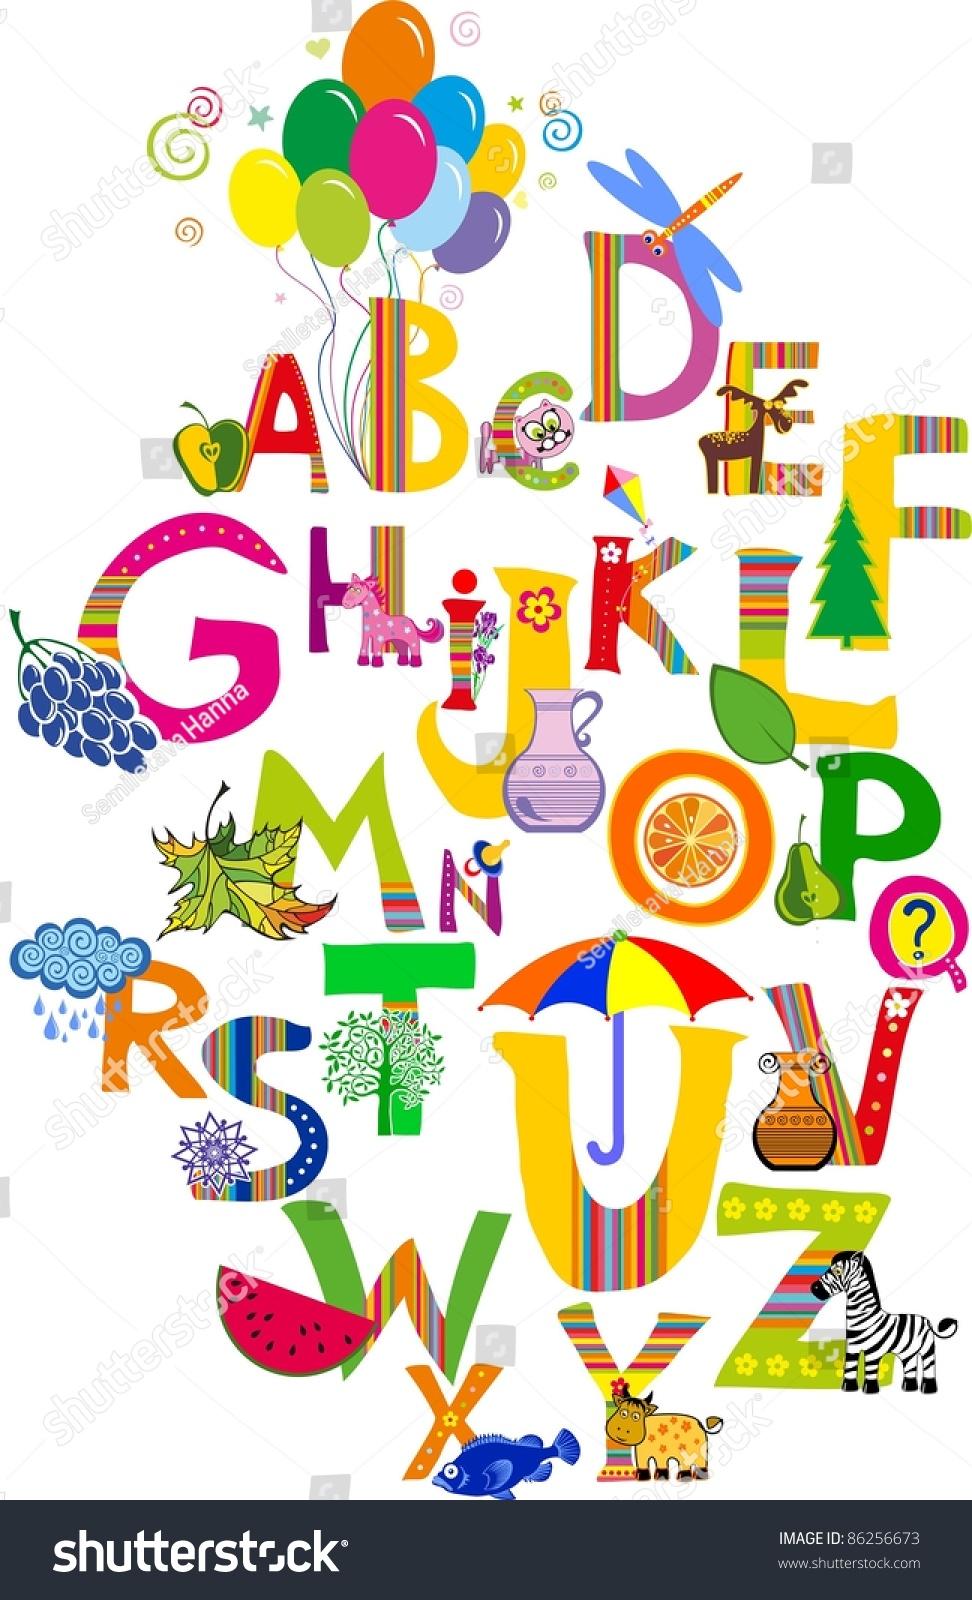 Abc. The Complete Children'S English Alphabet Splat Out ...